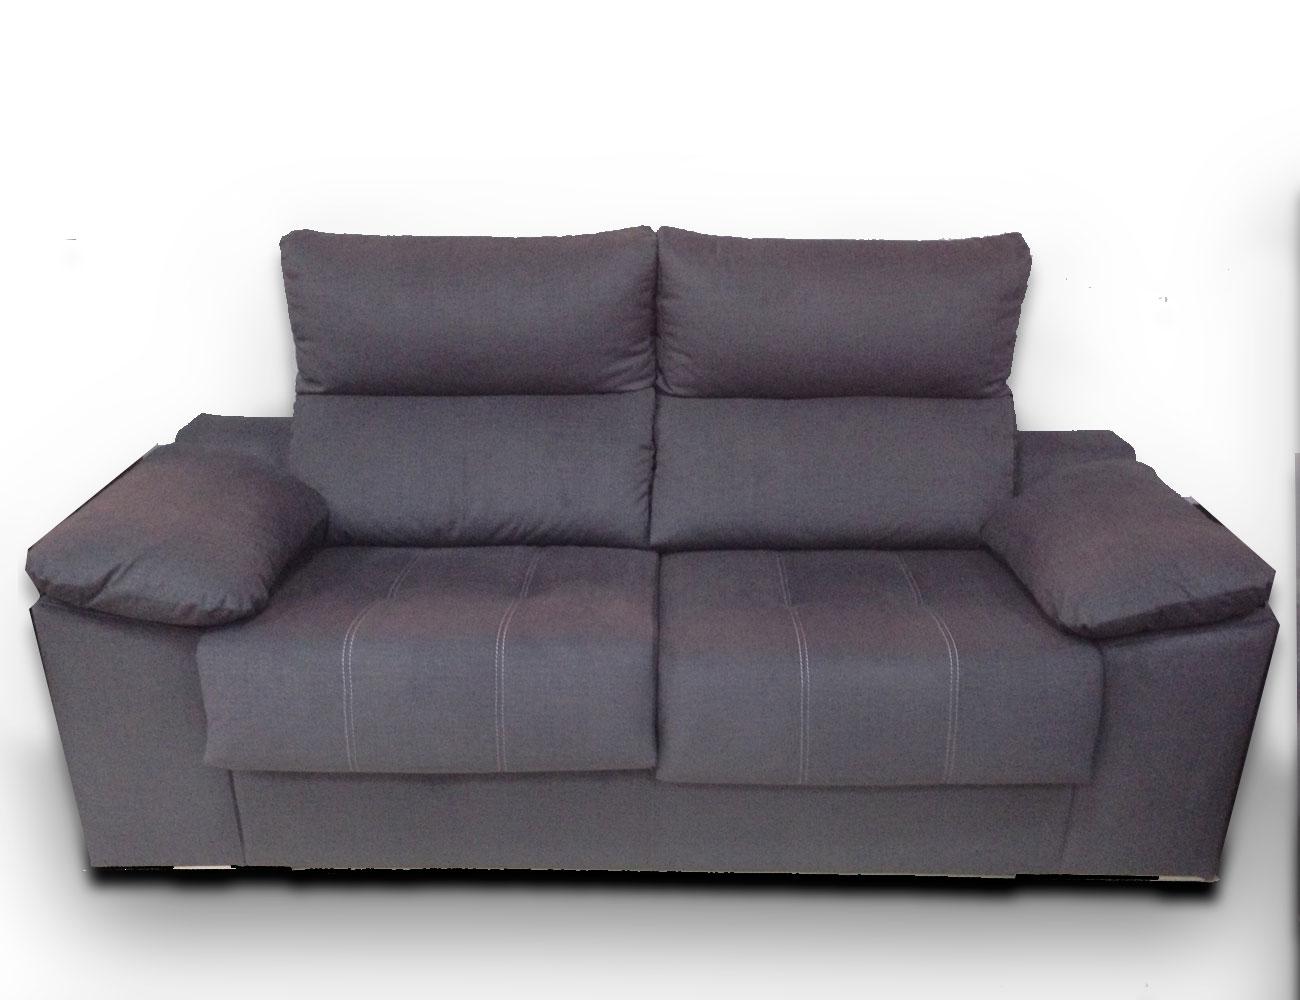 Sofa 3 plazas